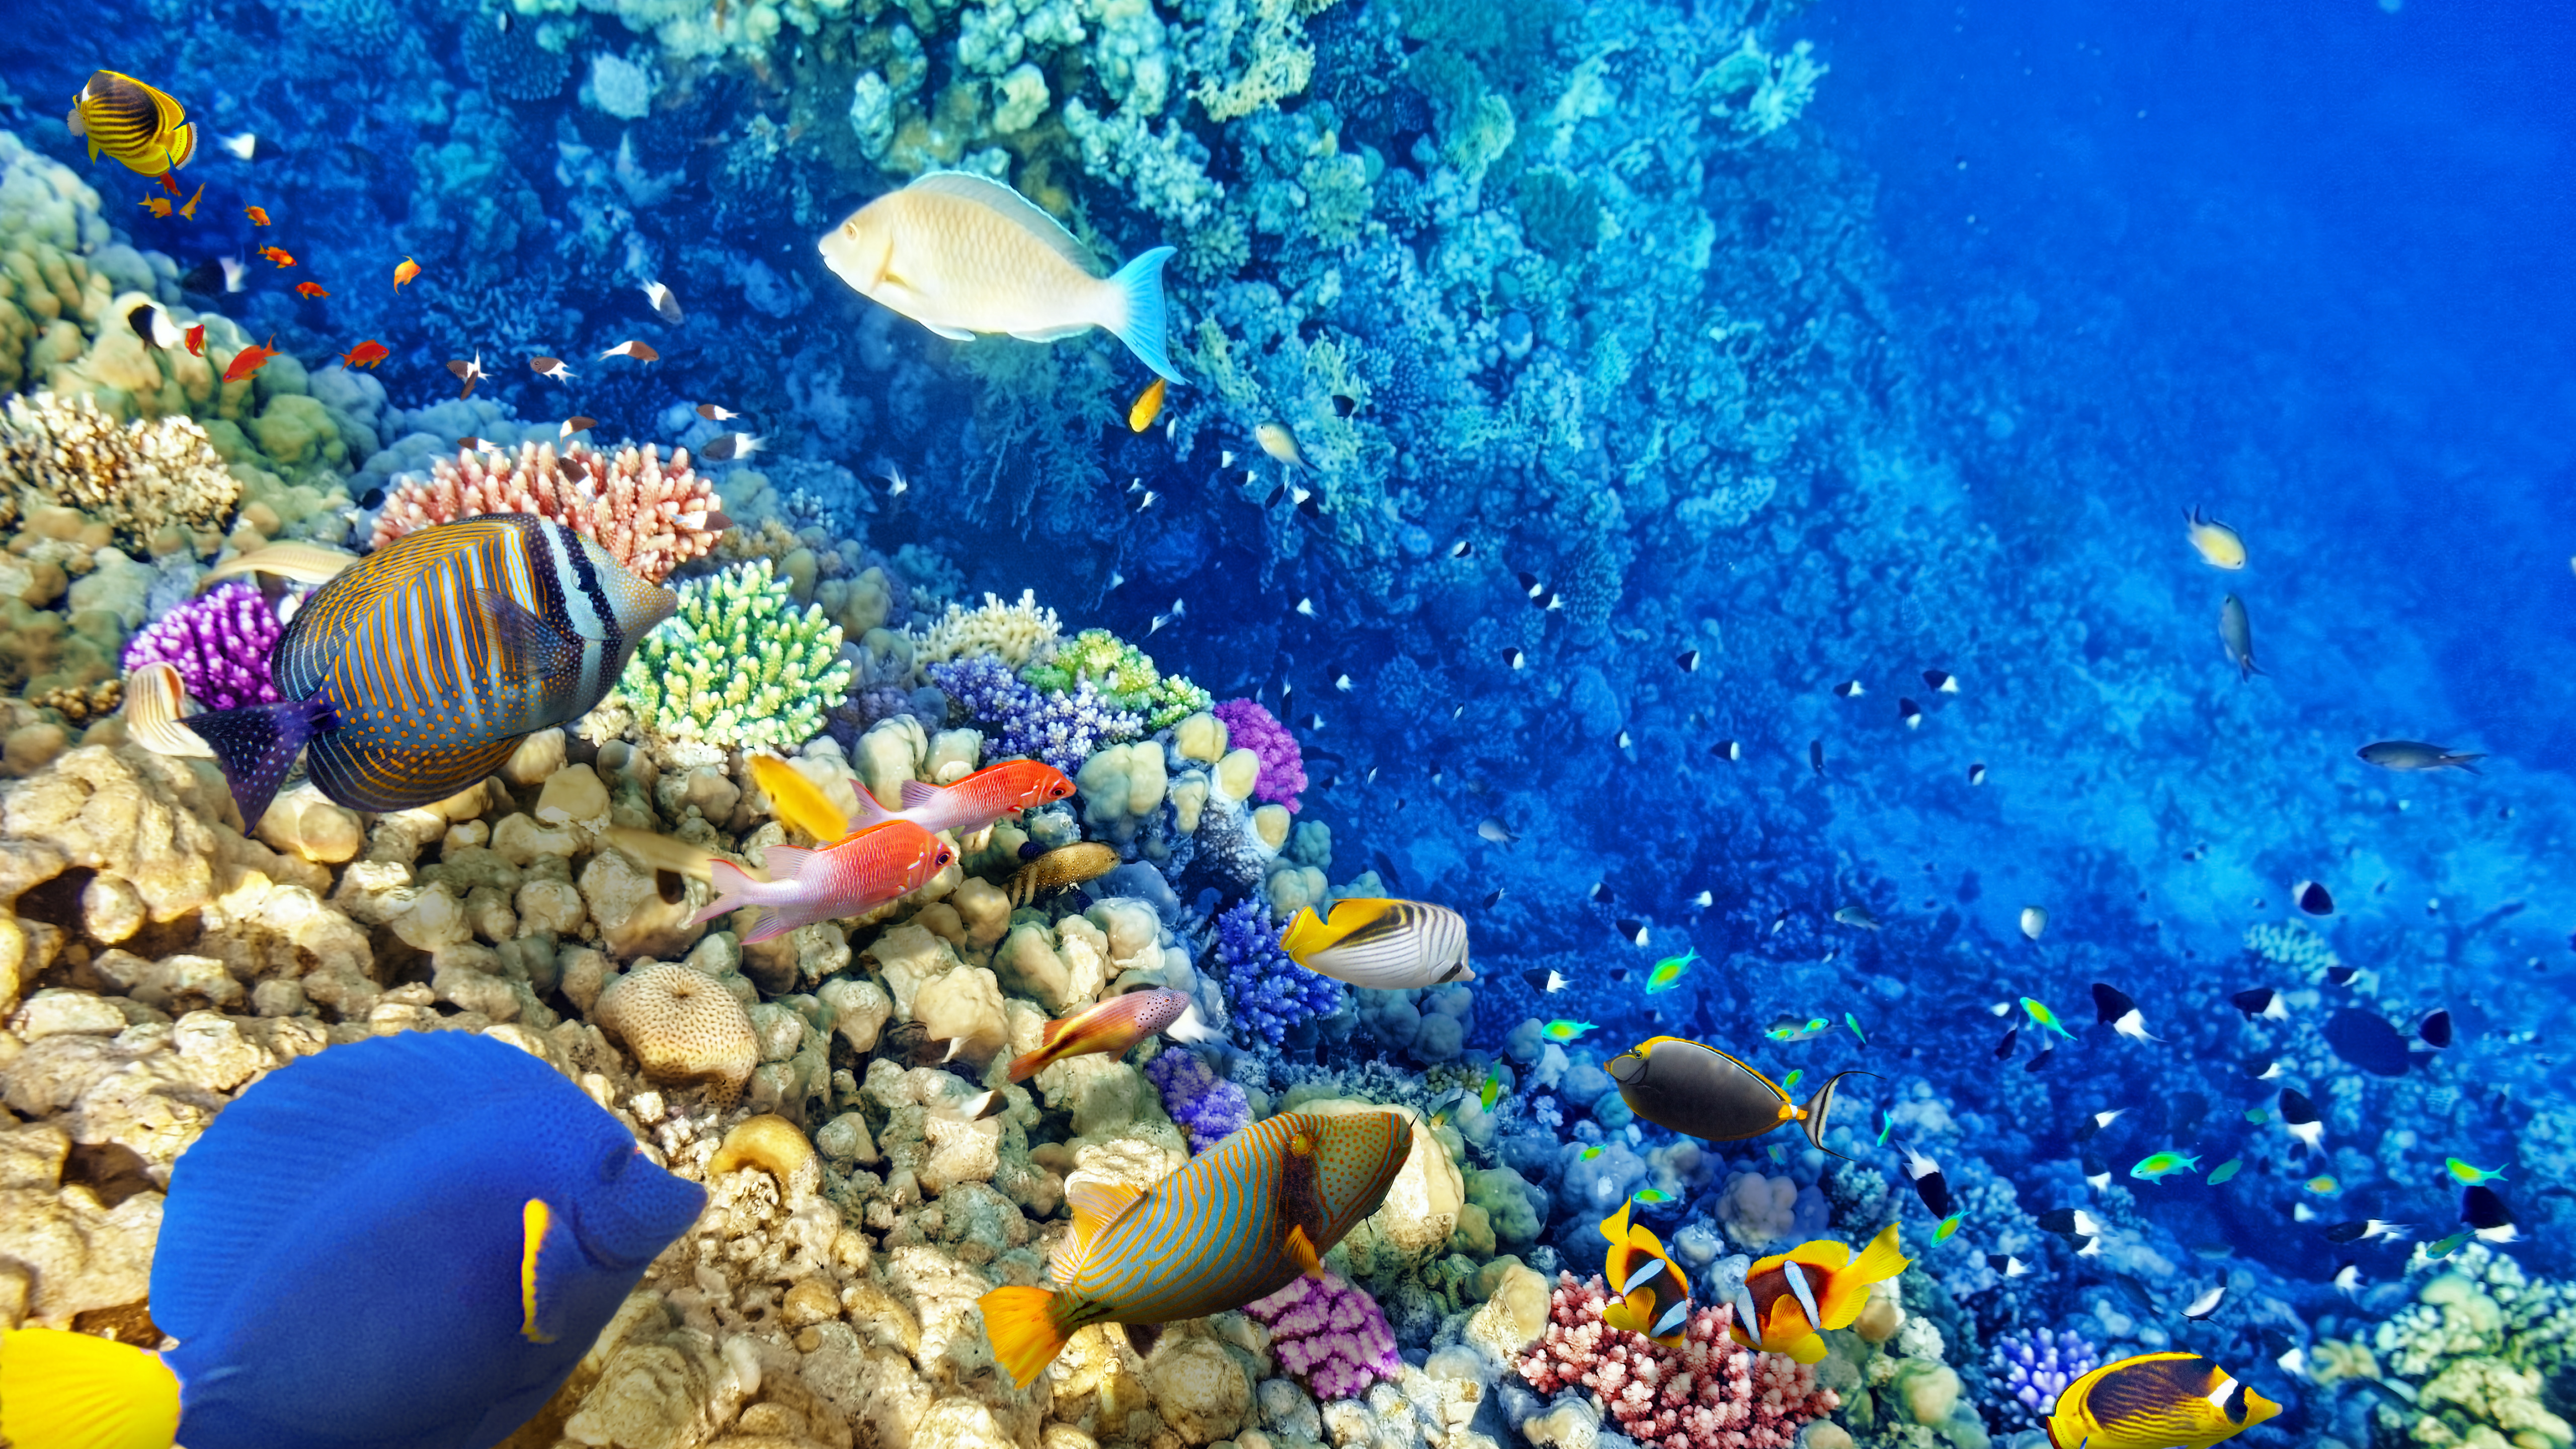 Картинки на рабочий стол море с рыбами